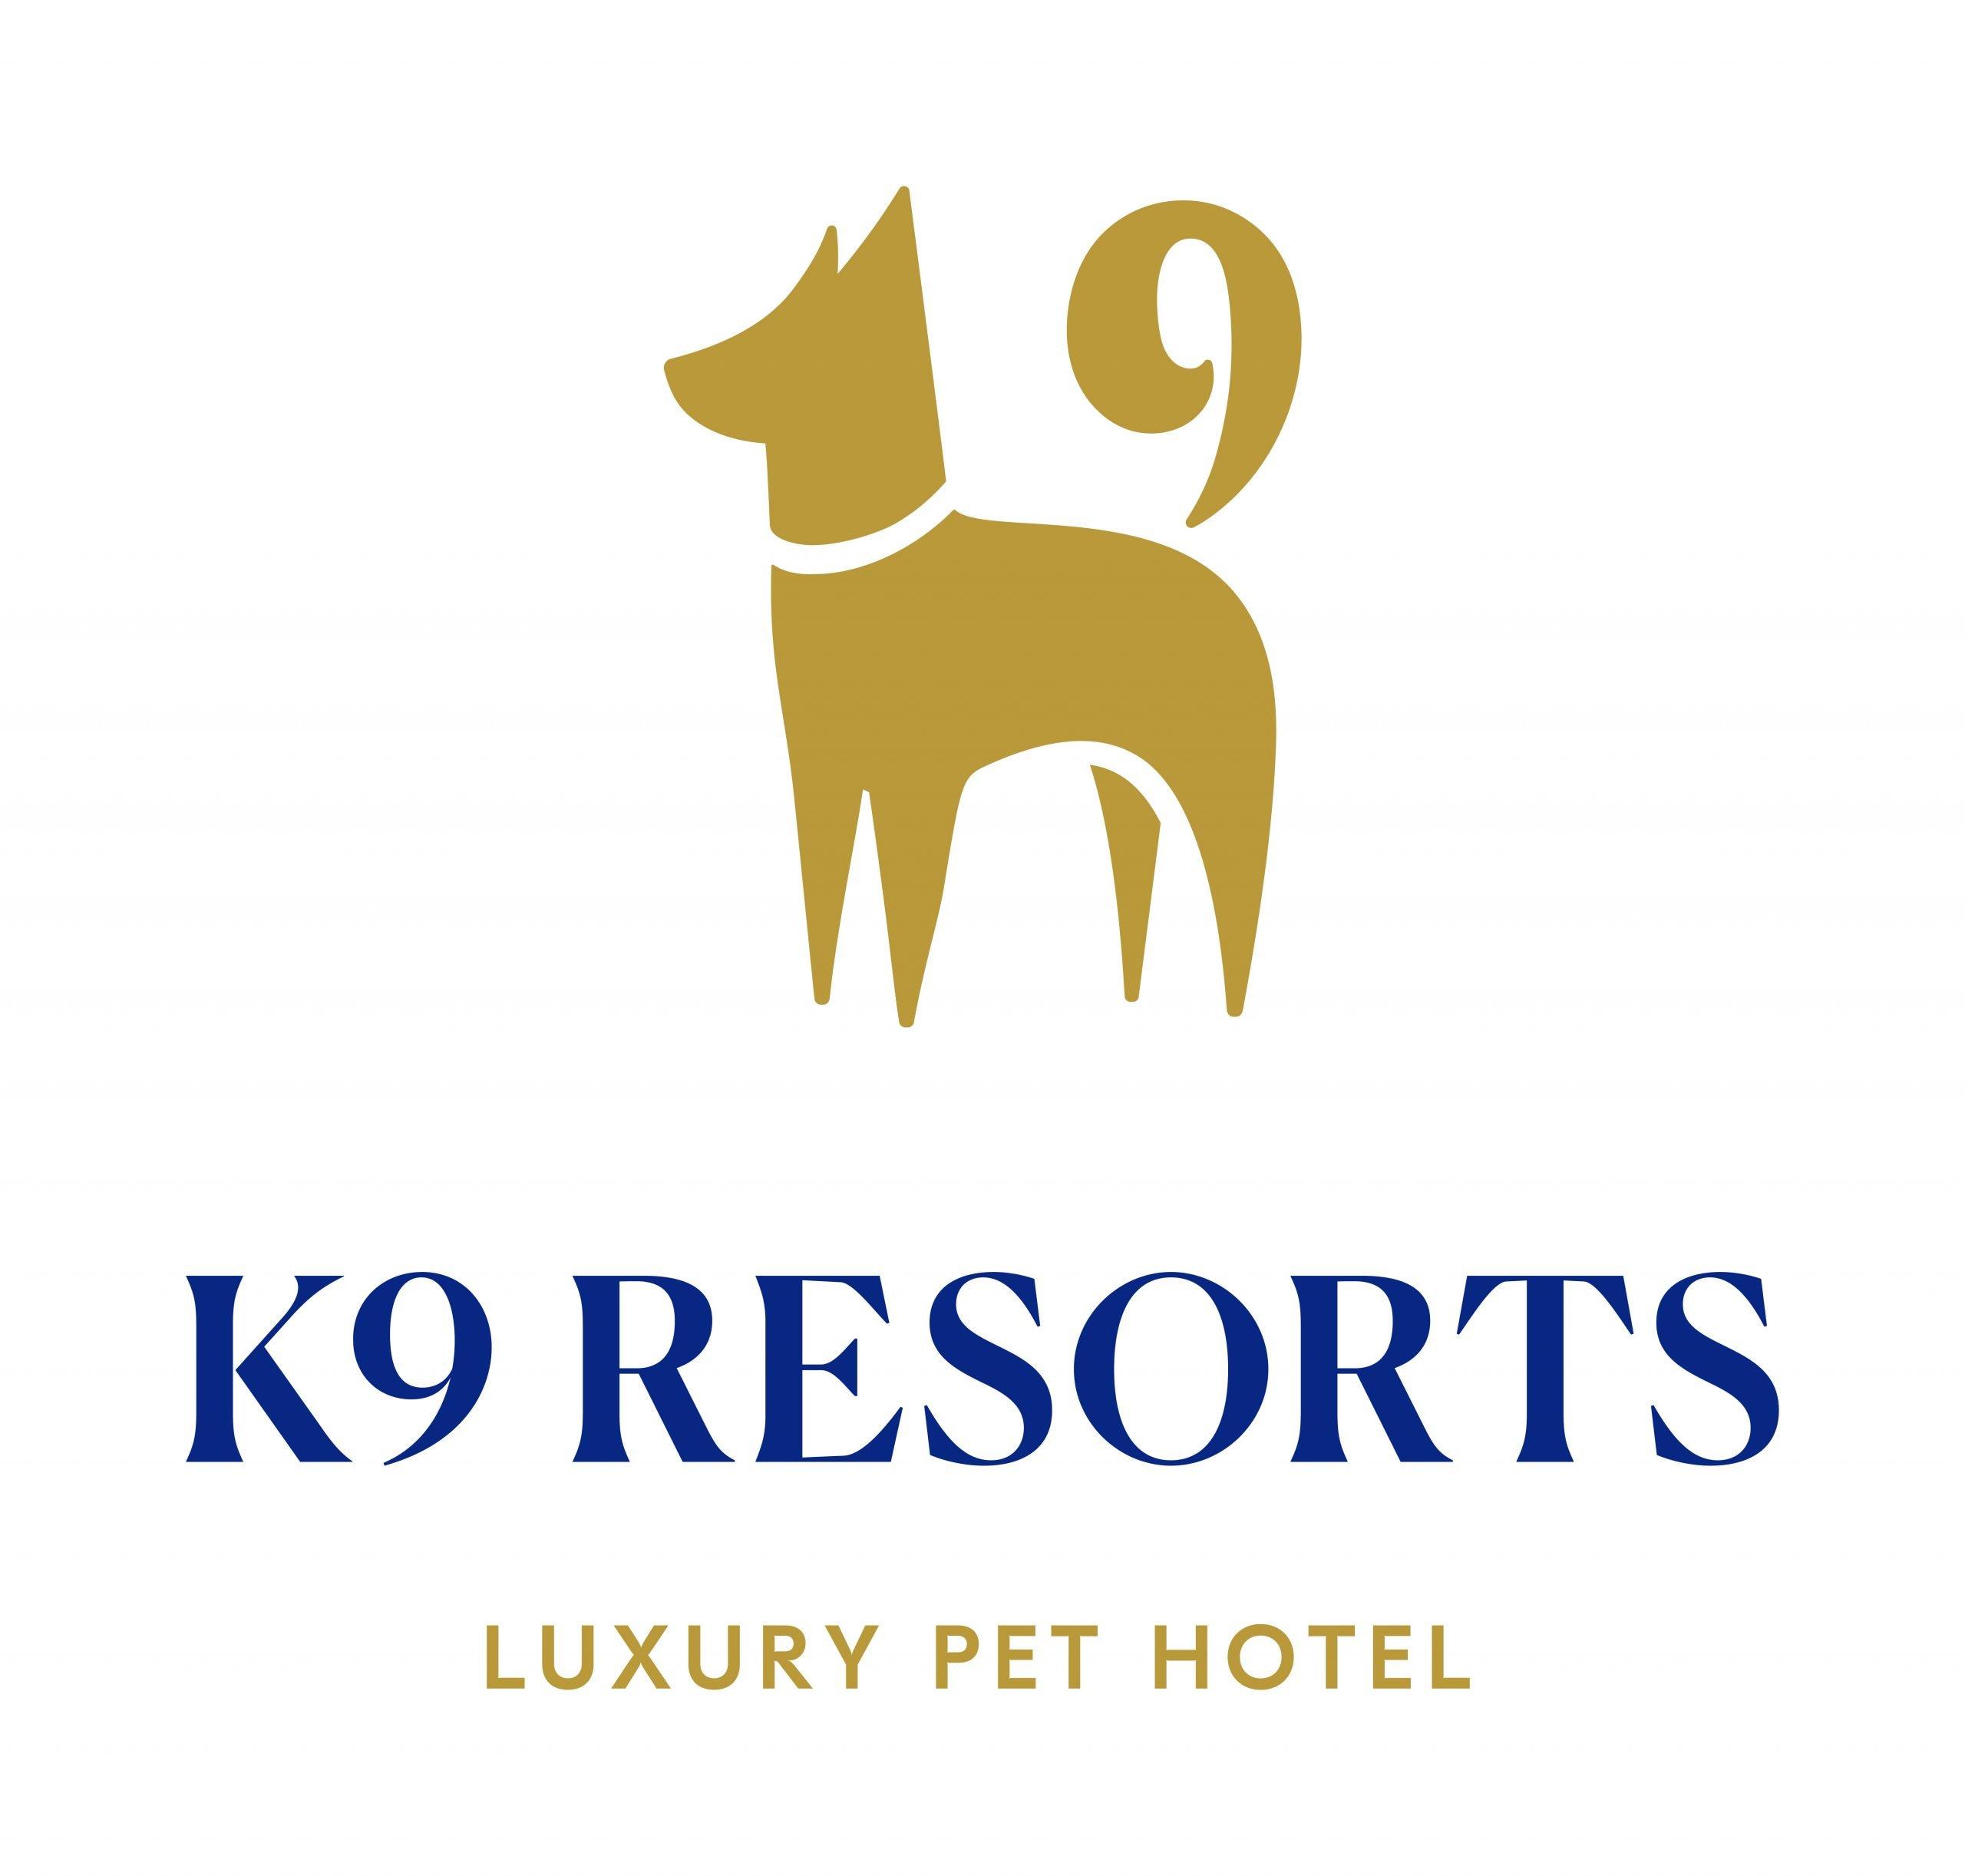 K9 Resorts Wellington